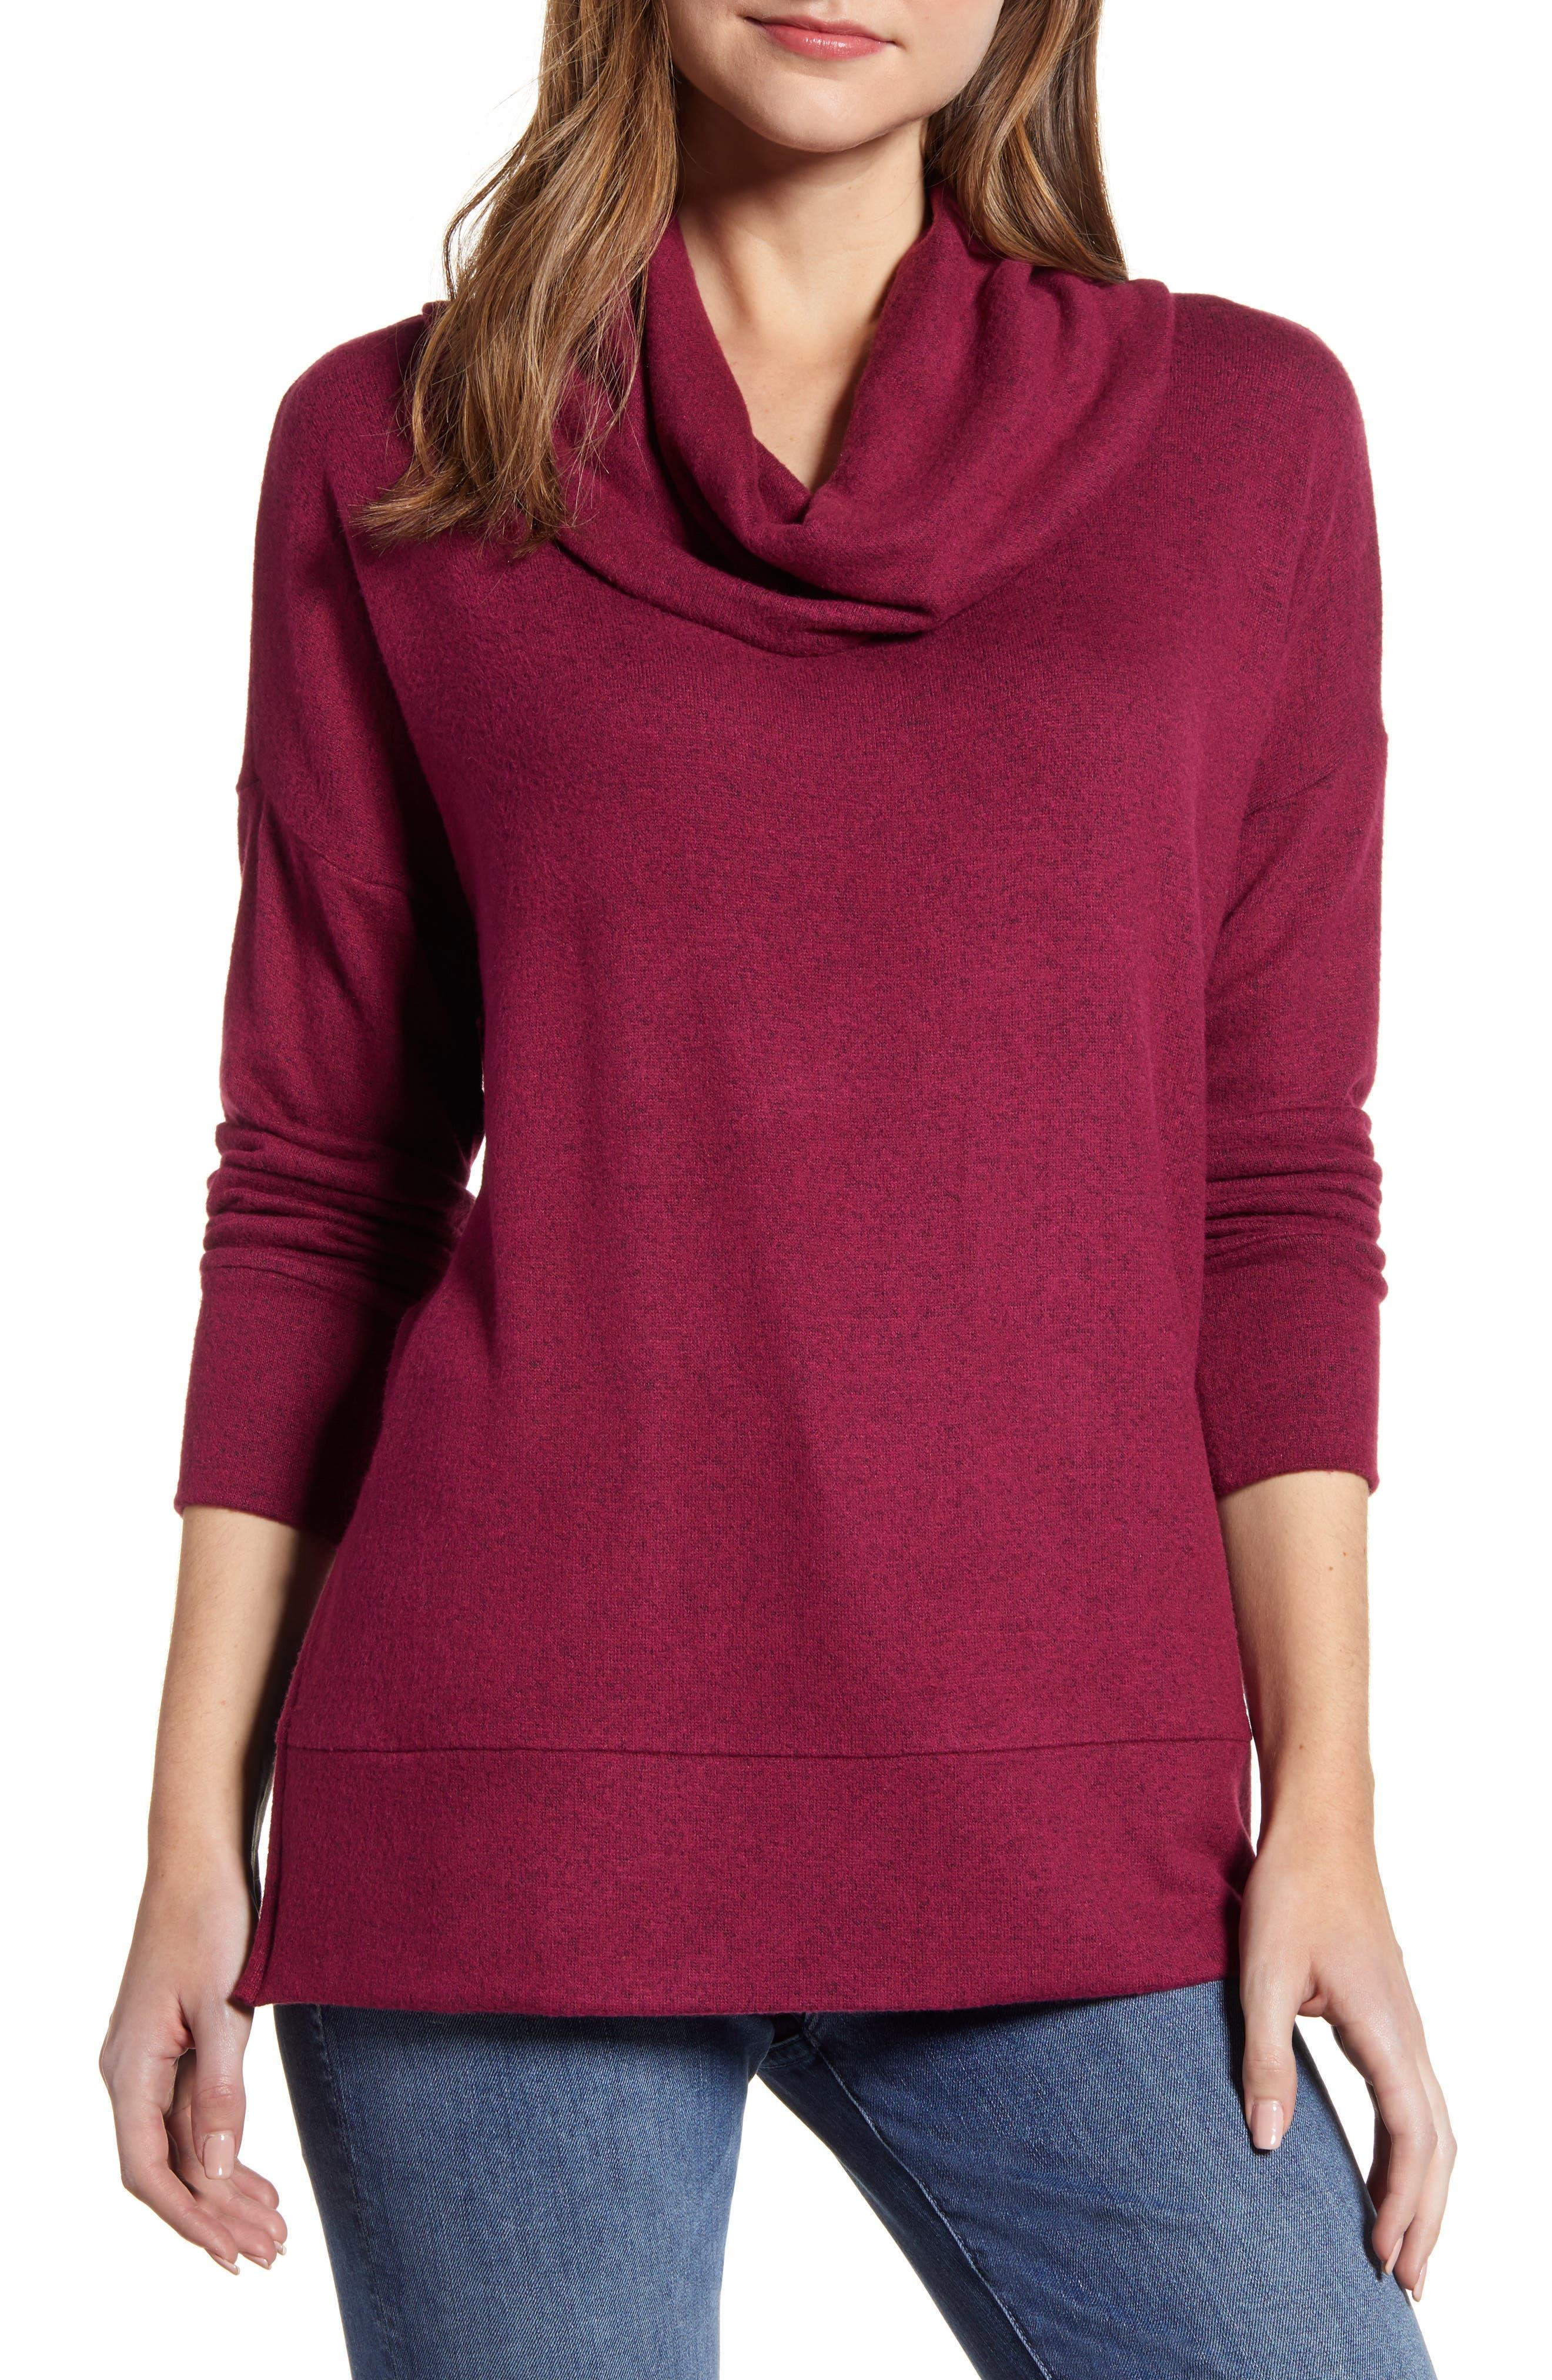 Women's Loveapella Cowl Neck Long Sleeve Top